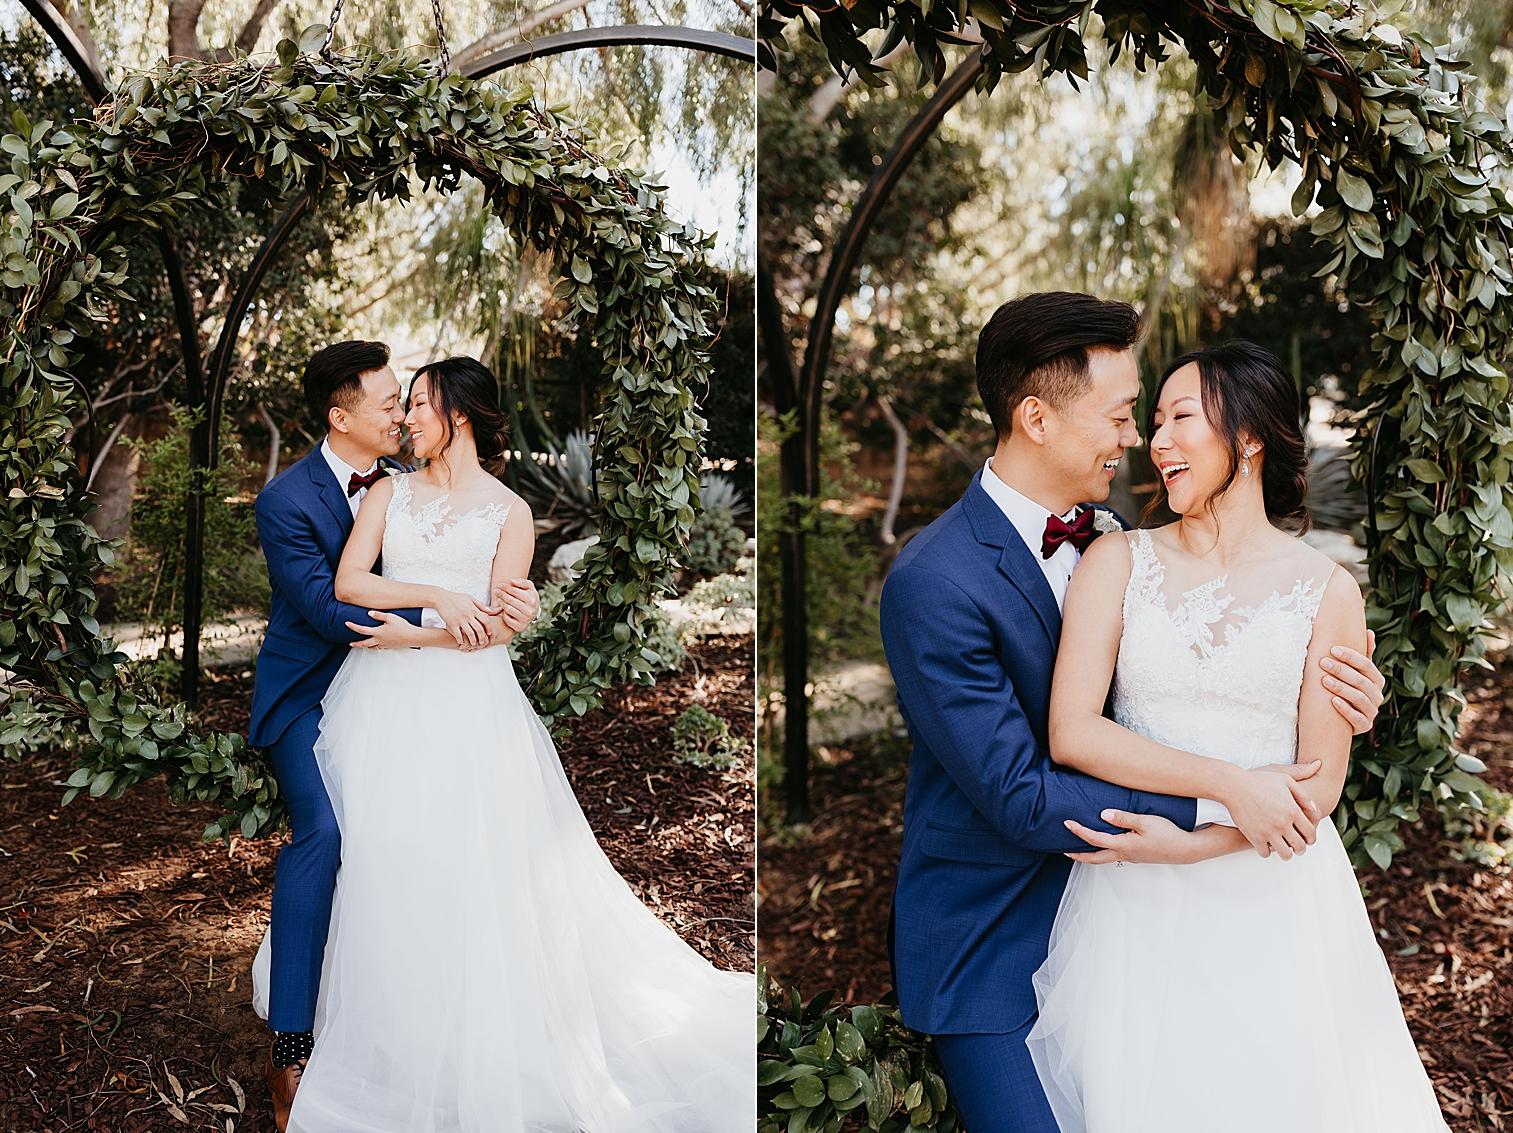 Secret-Garden-Rancho-Santa-Fe-Wedding-46.jpg